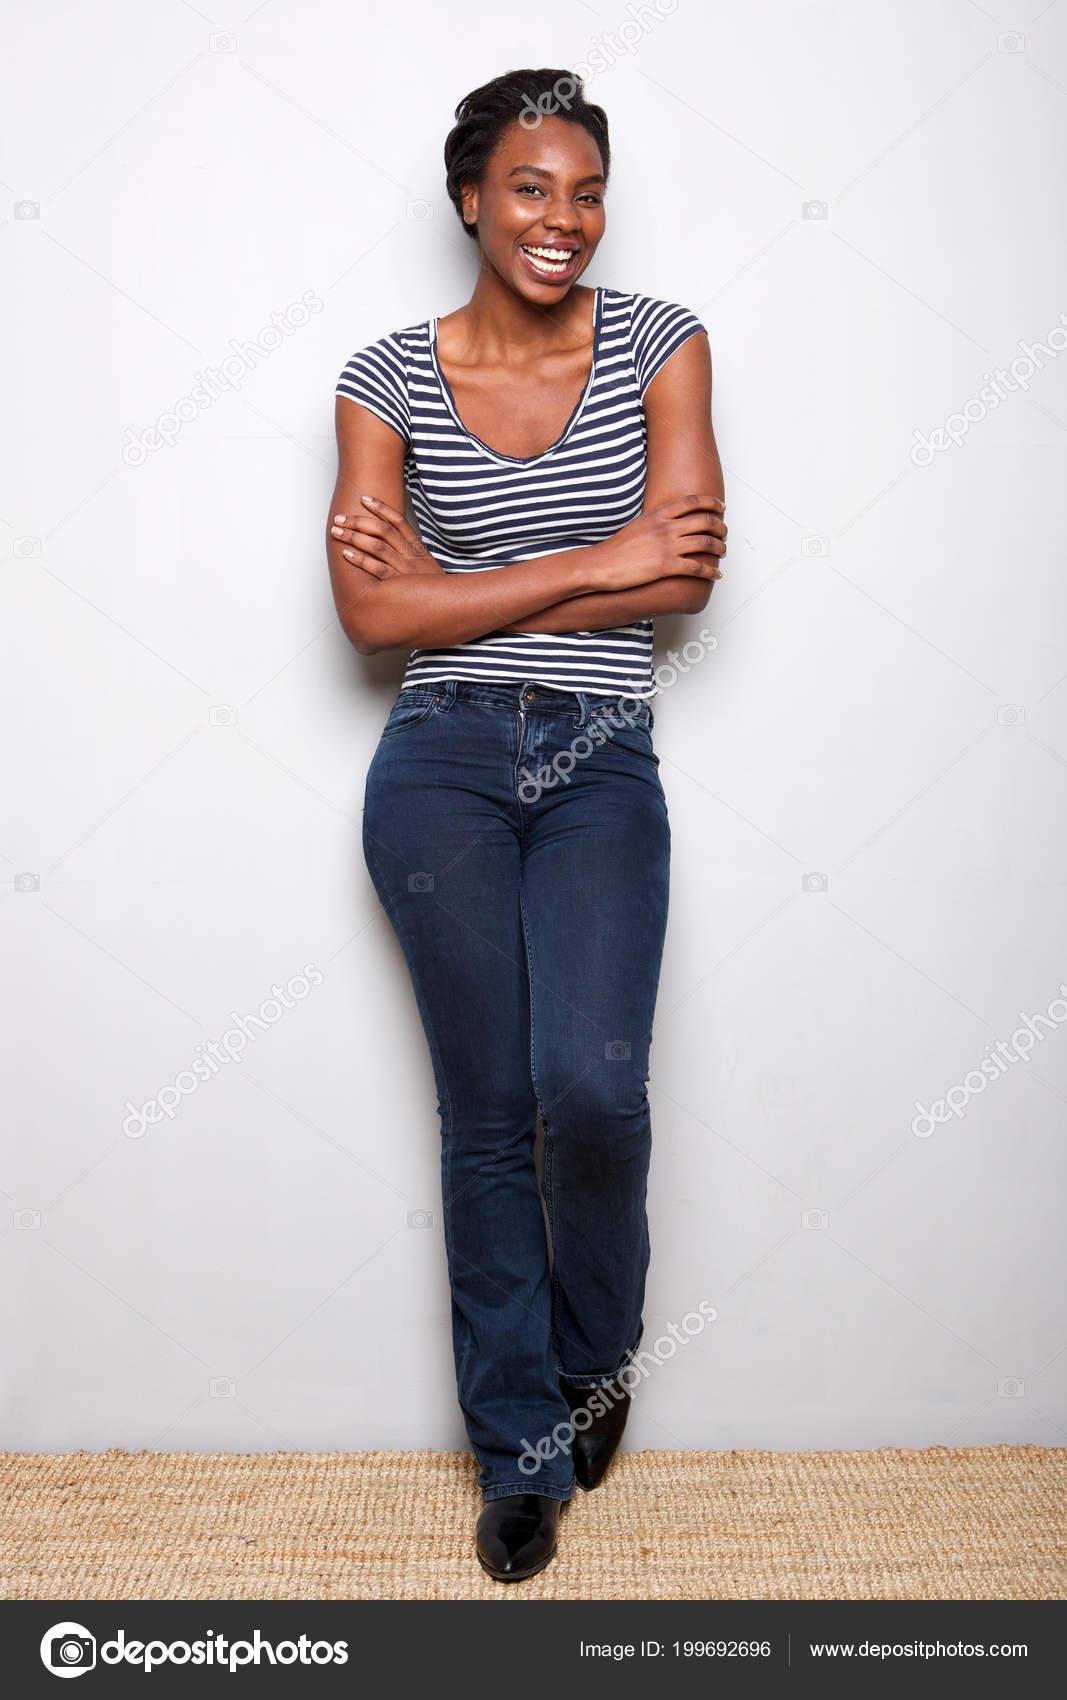 GroГџe schwarze Frau